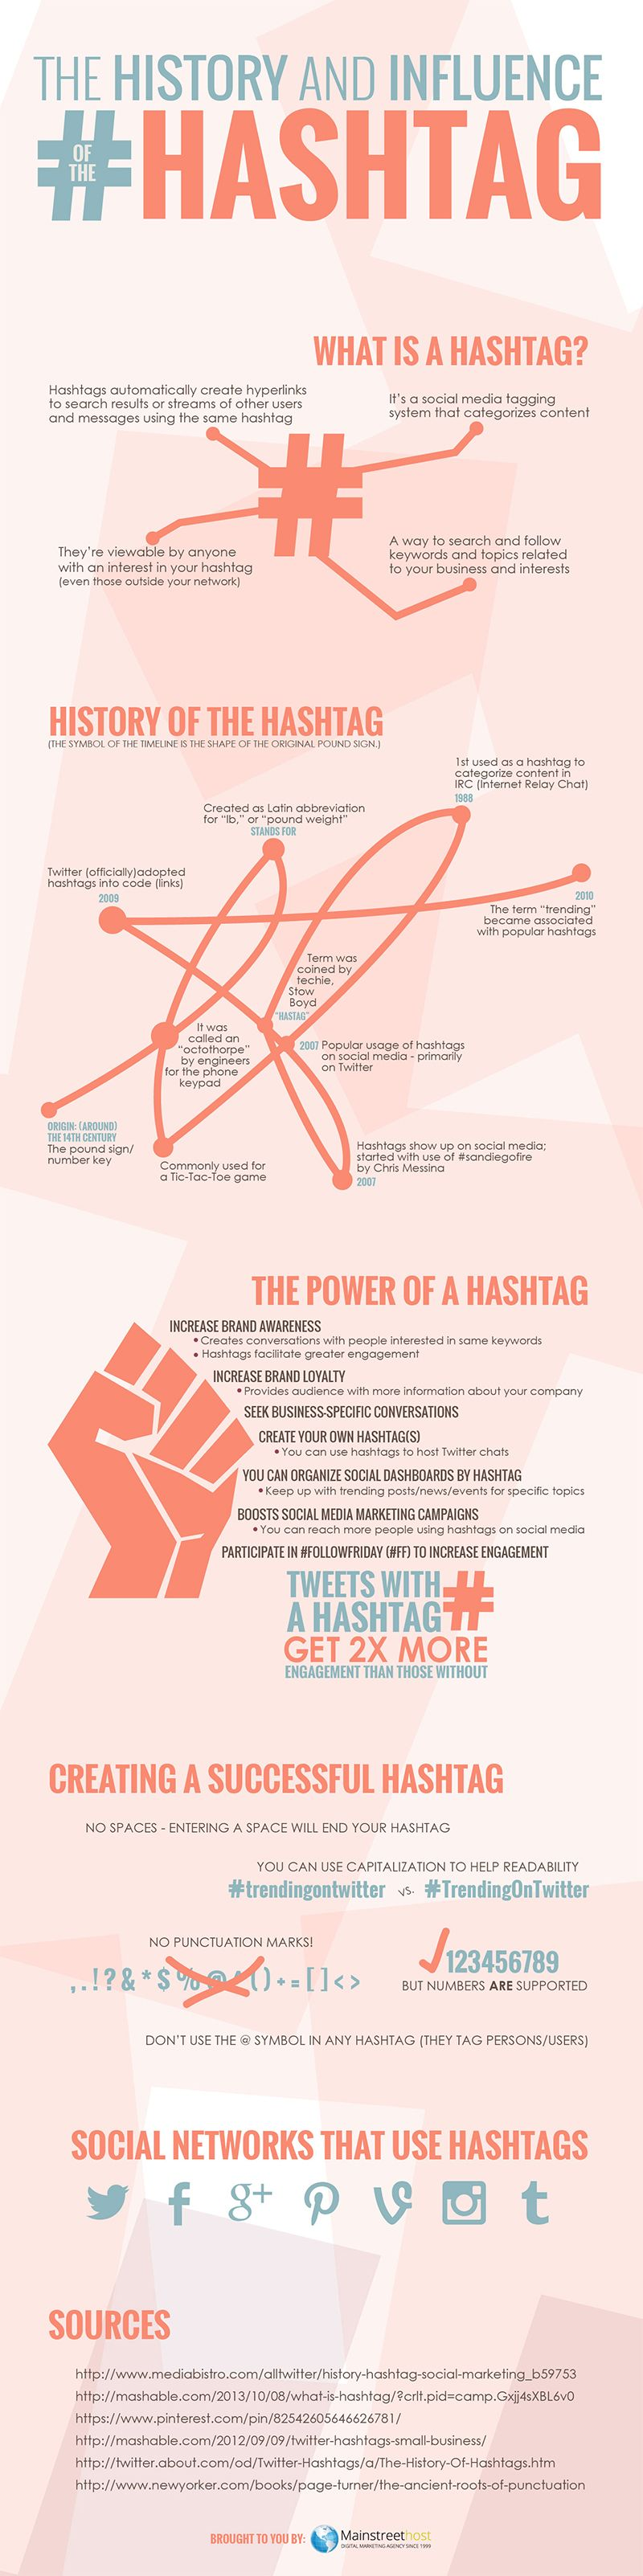 social media tips - 5 top reasons why you should use social media hashtags